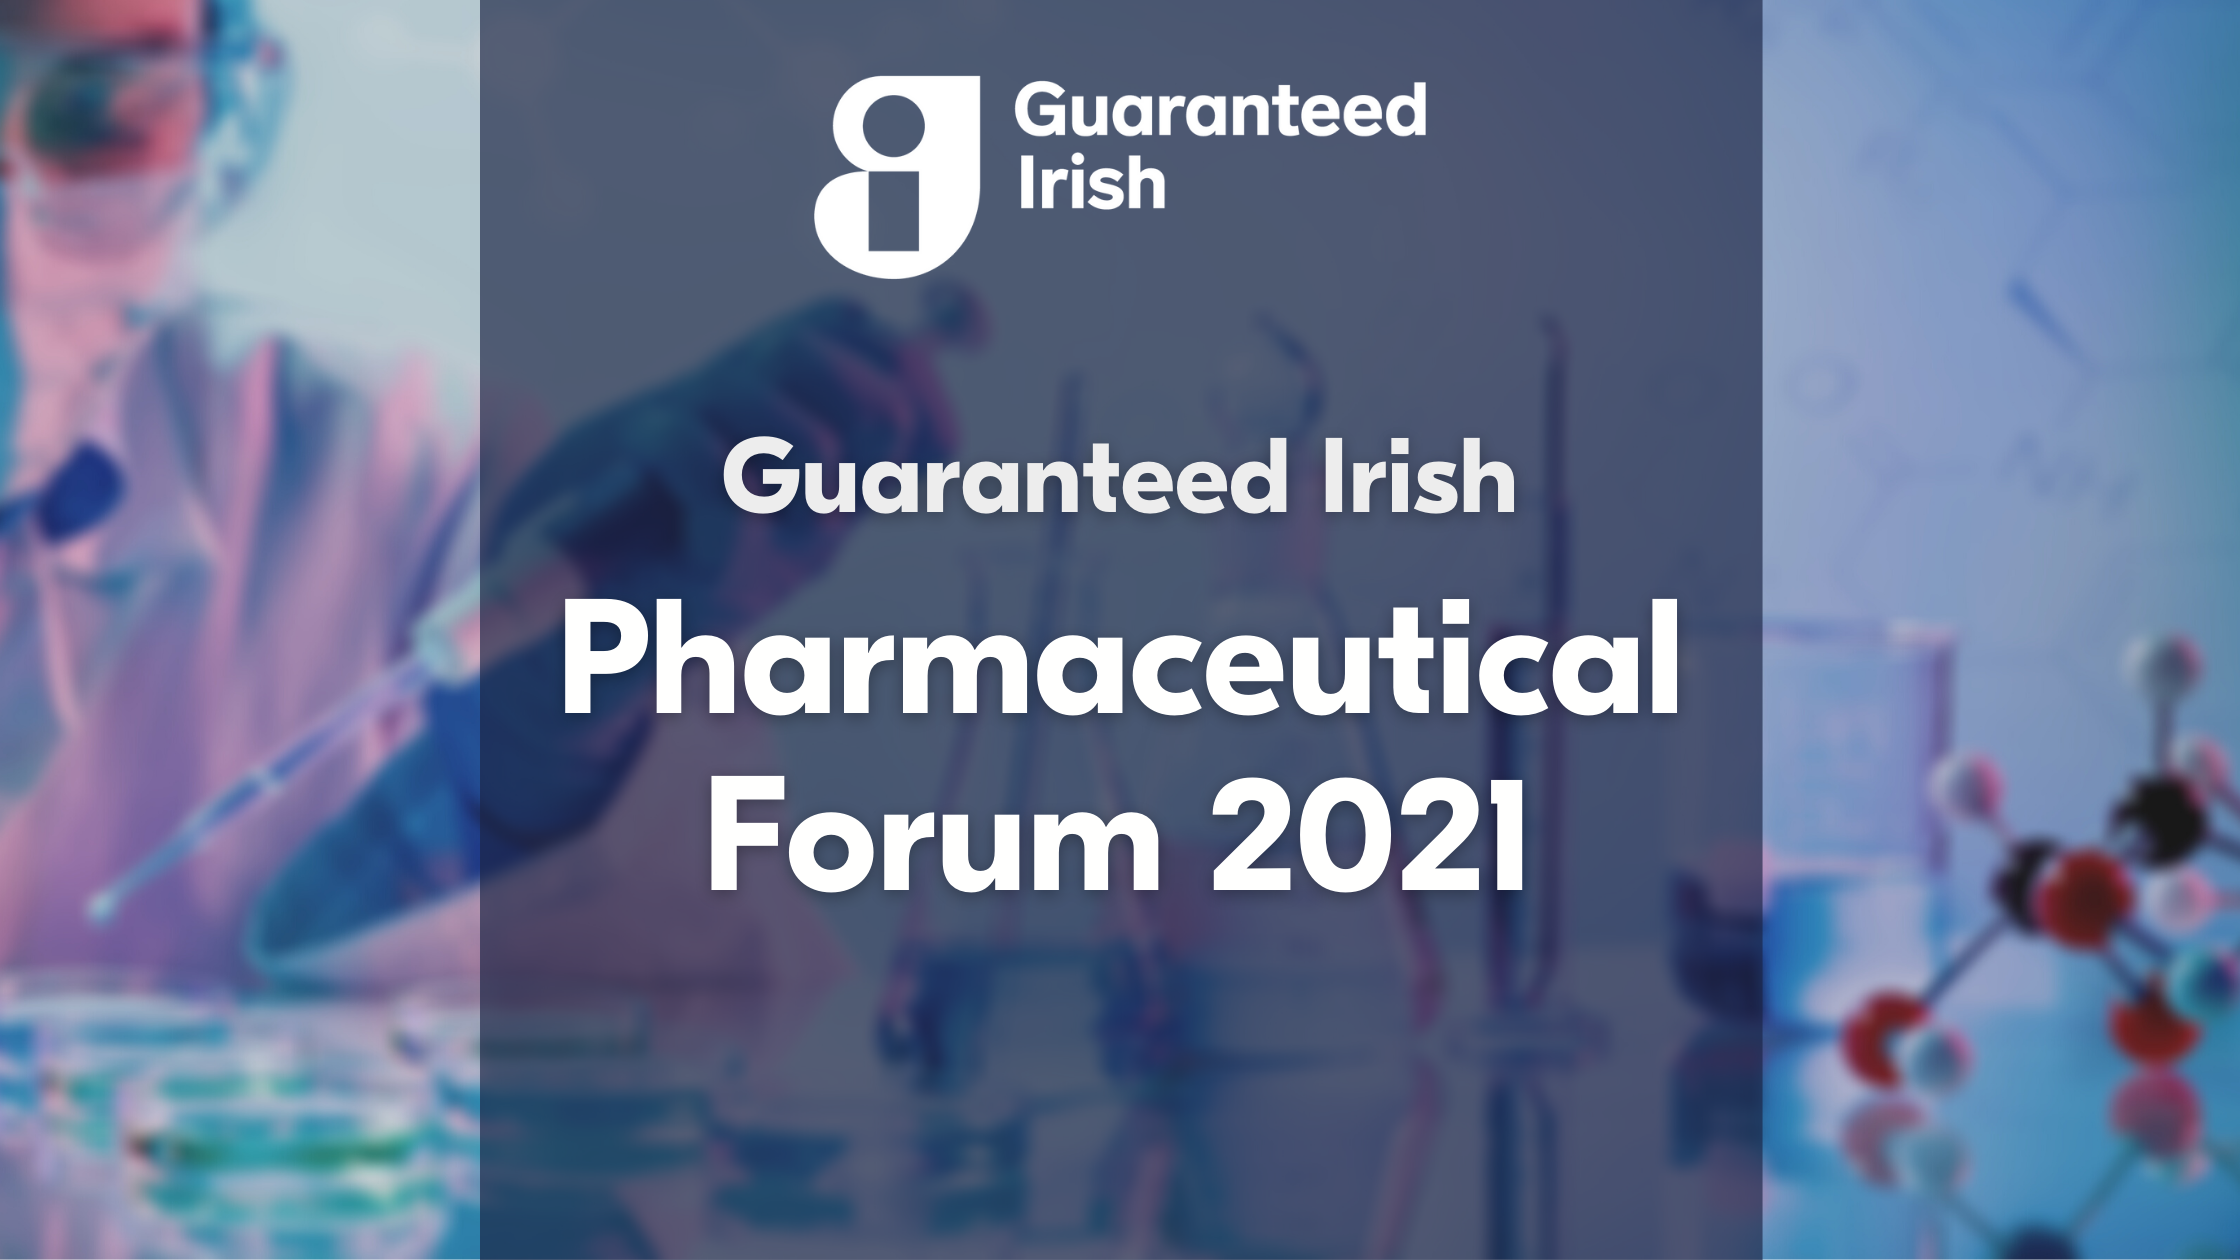 Guaranteed Irish Examine How to 'Futureproof Ireland's Thriving Pharmaceutical Sector in 2021'.